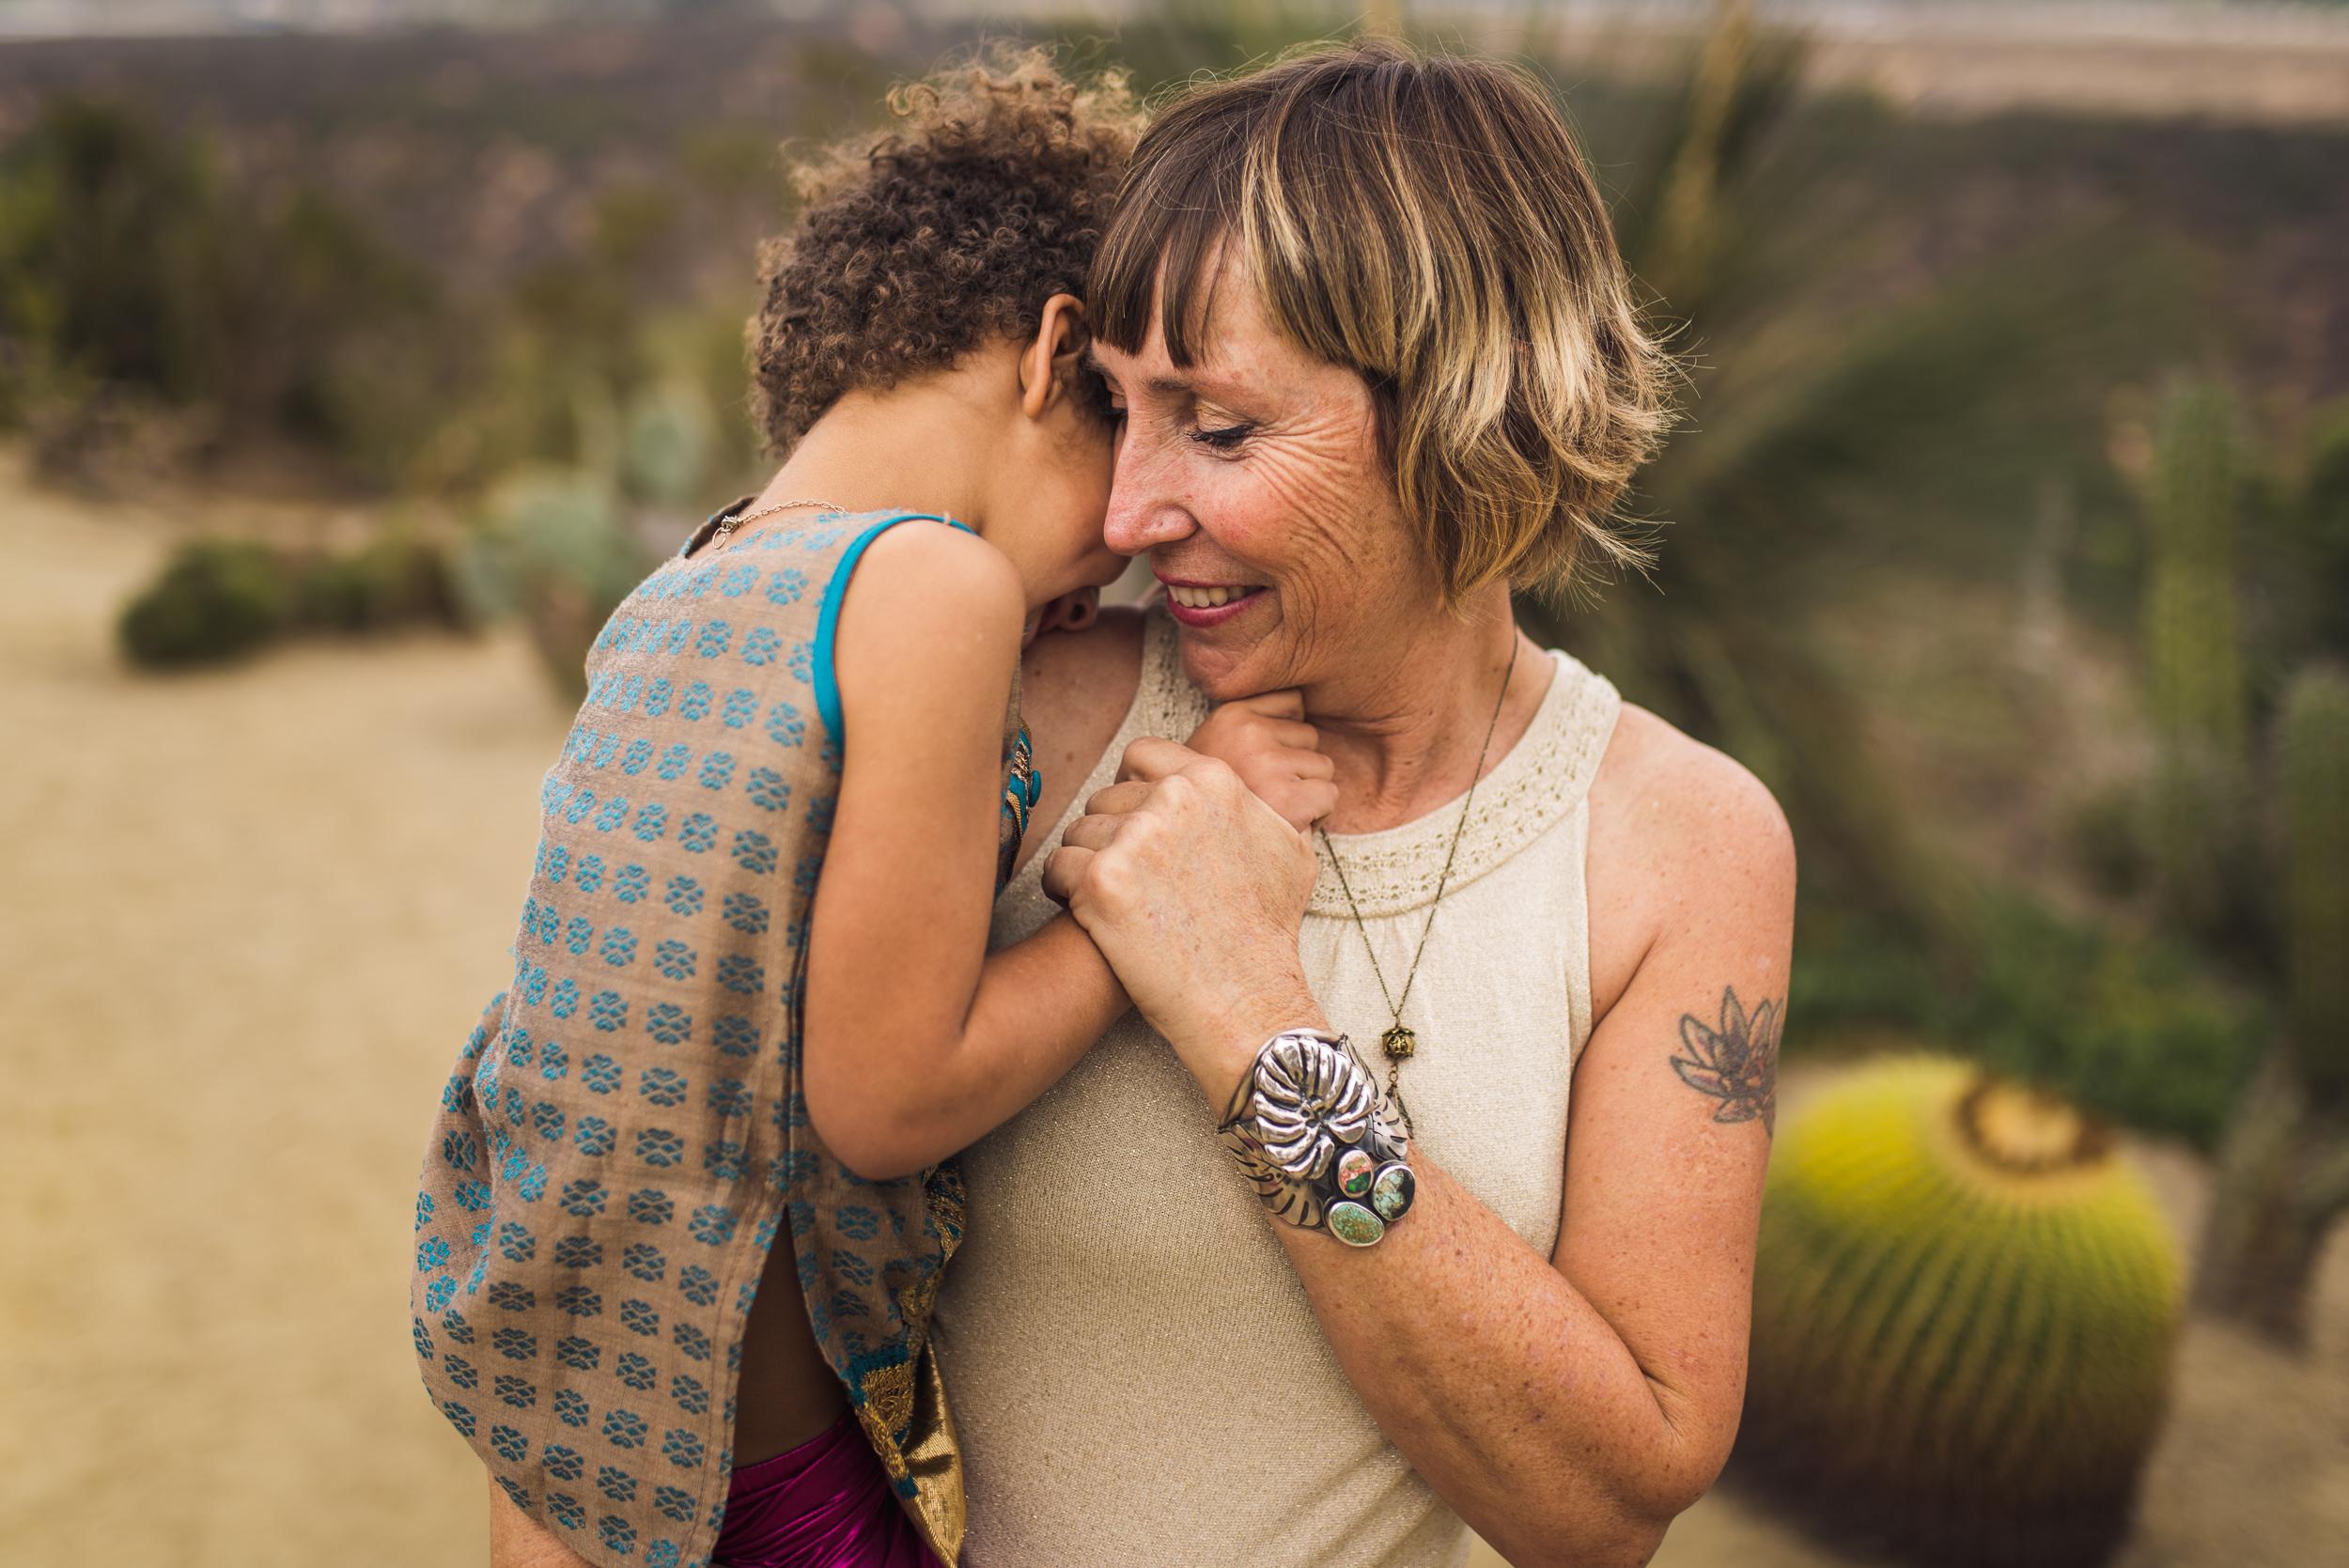 2018-San-Diego-Family-Lifestyle-Newborn-Travel-Vacation-Photographer-Kelsey-Smith-Photography-Coronado-La-Jolla-Encinitas-Solana-Beach-Del-Mar-38.jpg